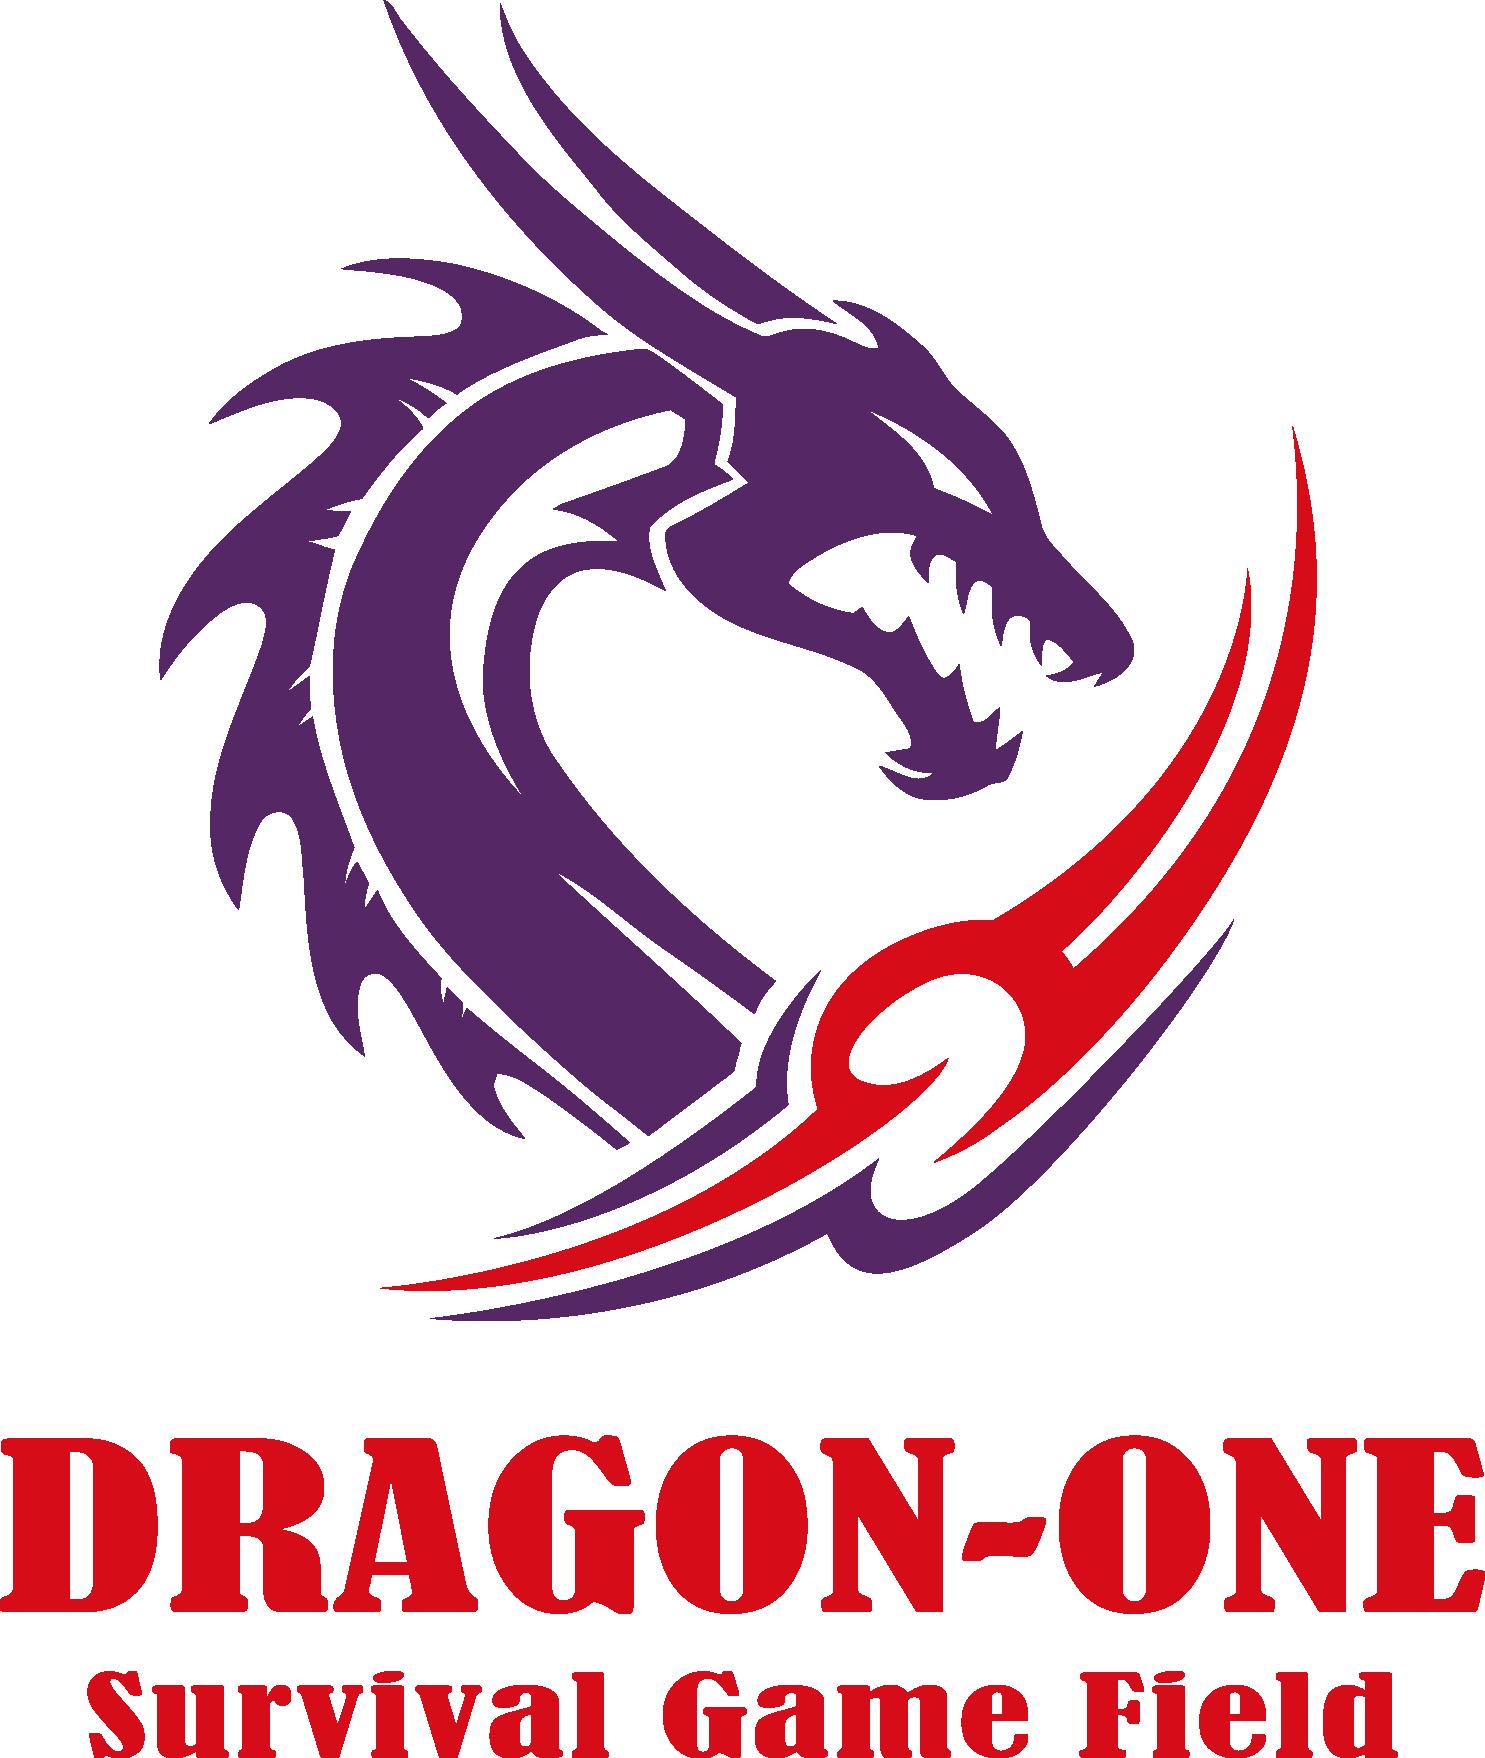 DRAGON-ONE 群馬サバゲーフィールド